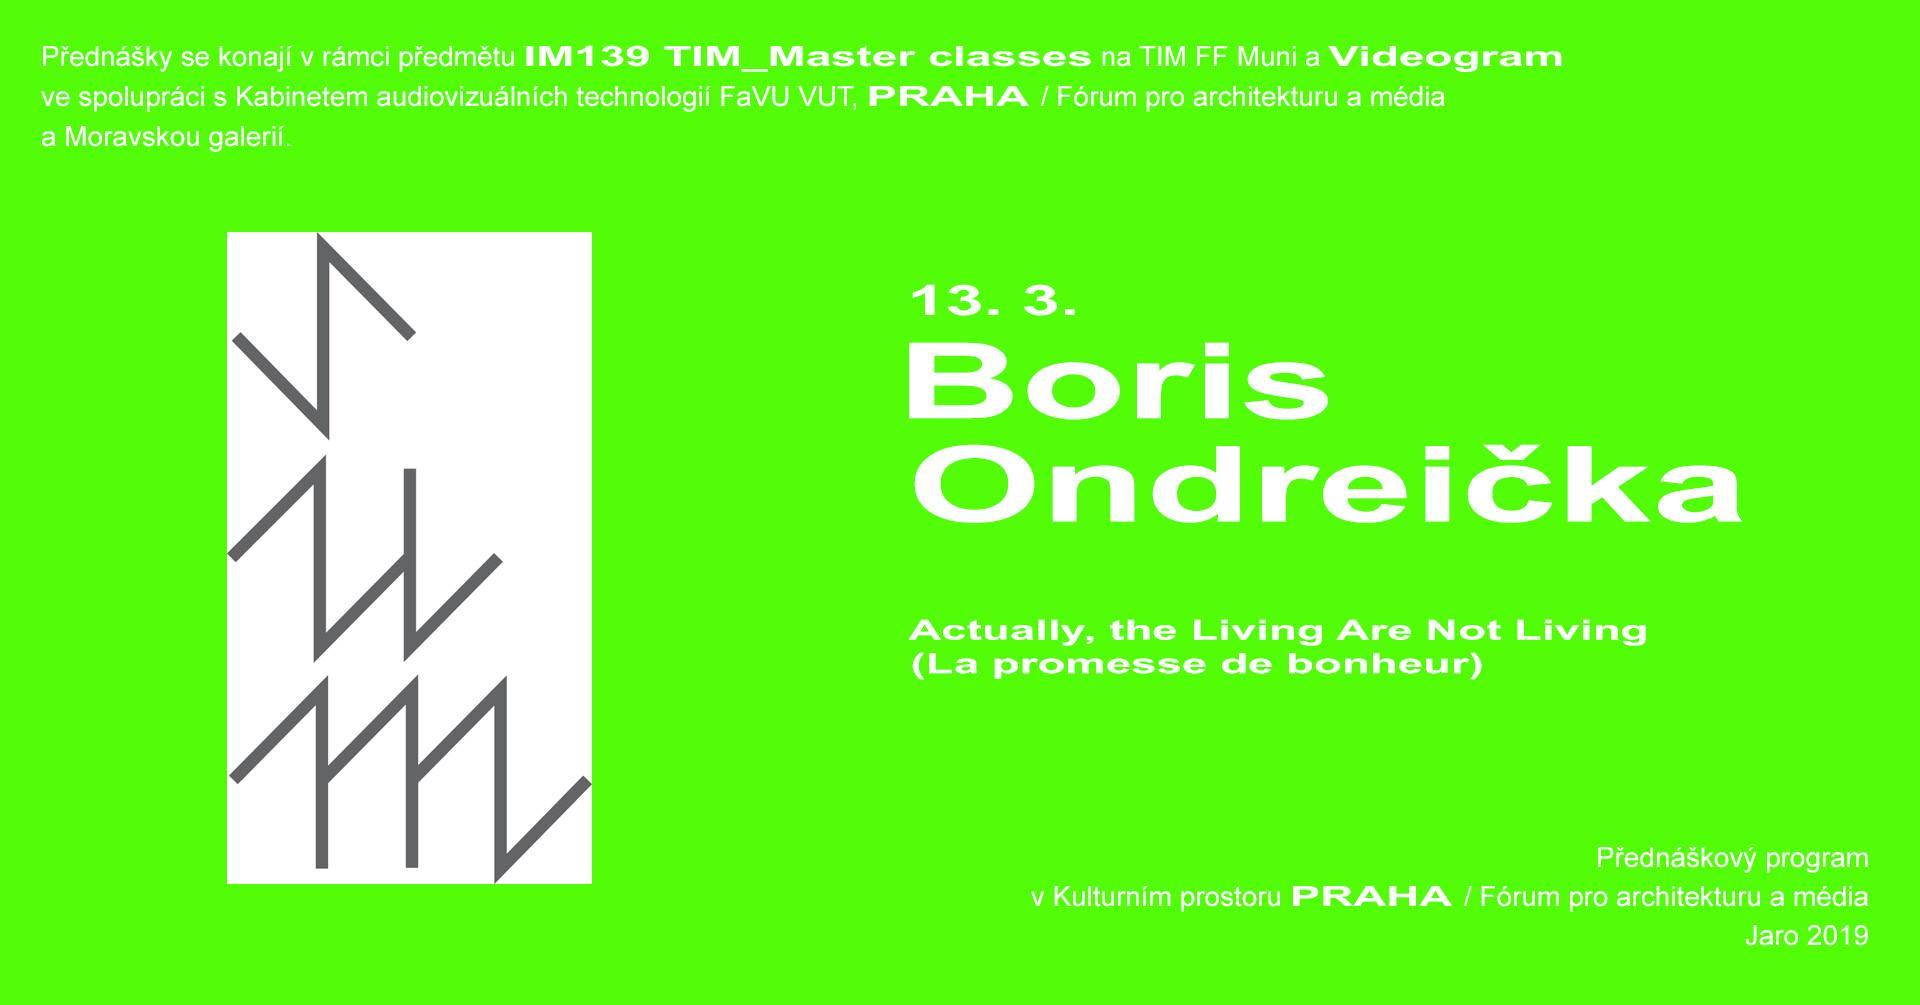 ST / 13.3. / 19.00 / Videogram 85 / TIM Master class: Boris Ondreička- Actually, the Living Are Not Living (La promesse de bonheur) / přednáška, projekce